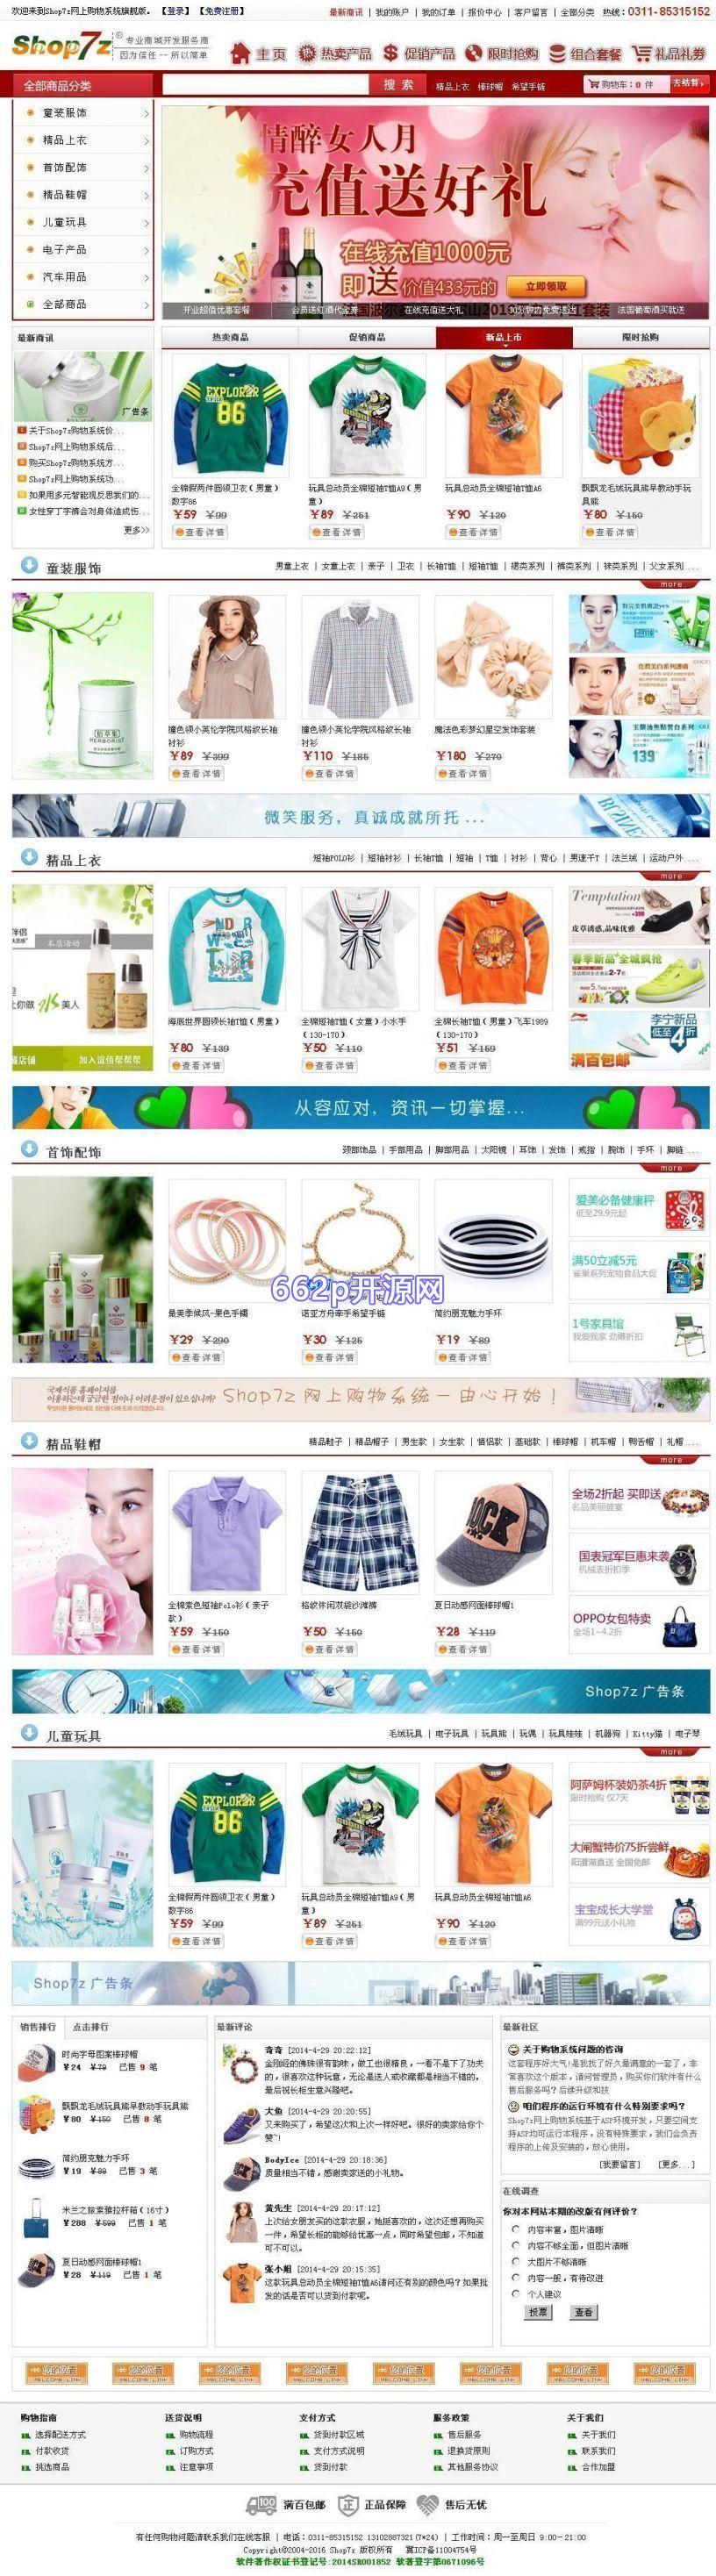 Shop7z网上购物系统旗舰版